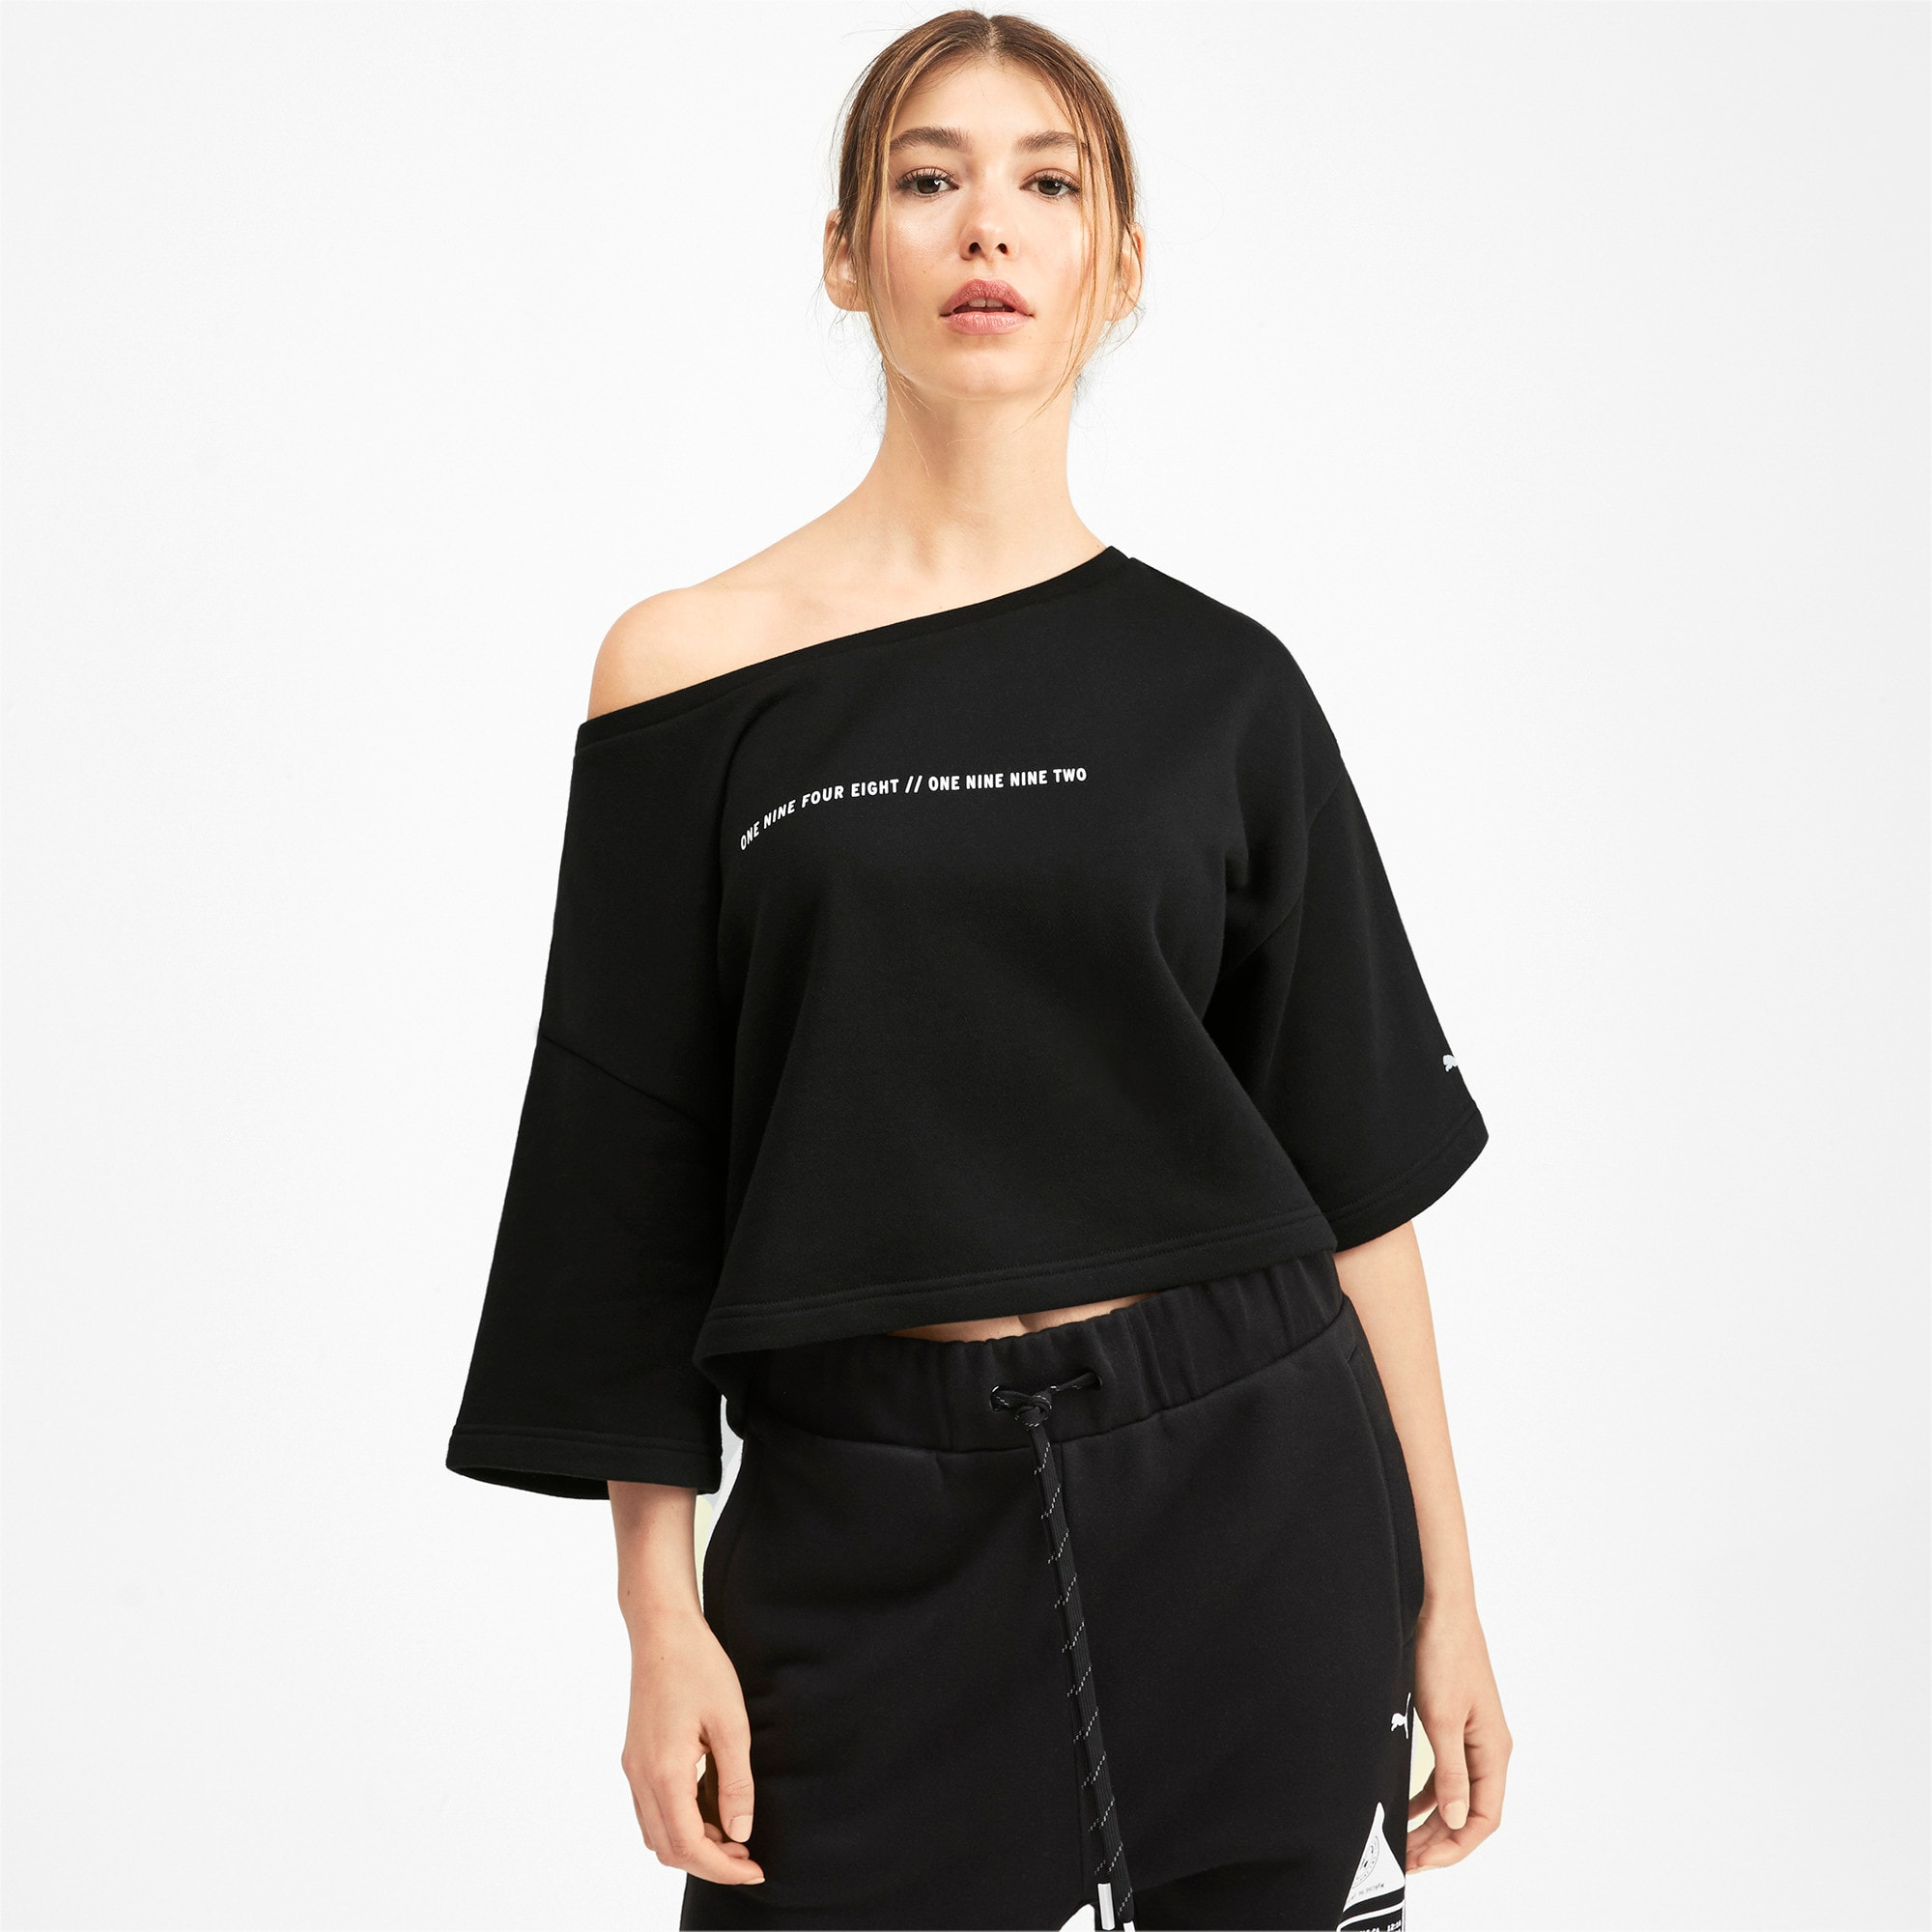 Thumbnail 1 of PUMA x SELENA GOMEZ Cropped Short Sleeve Women's Sweater, Puma Black, medium